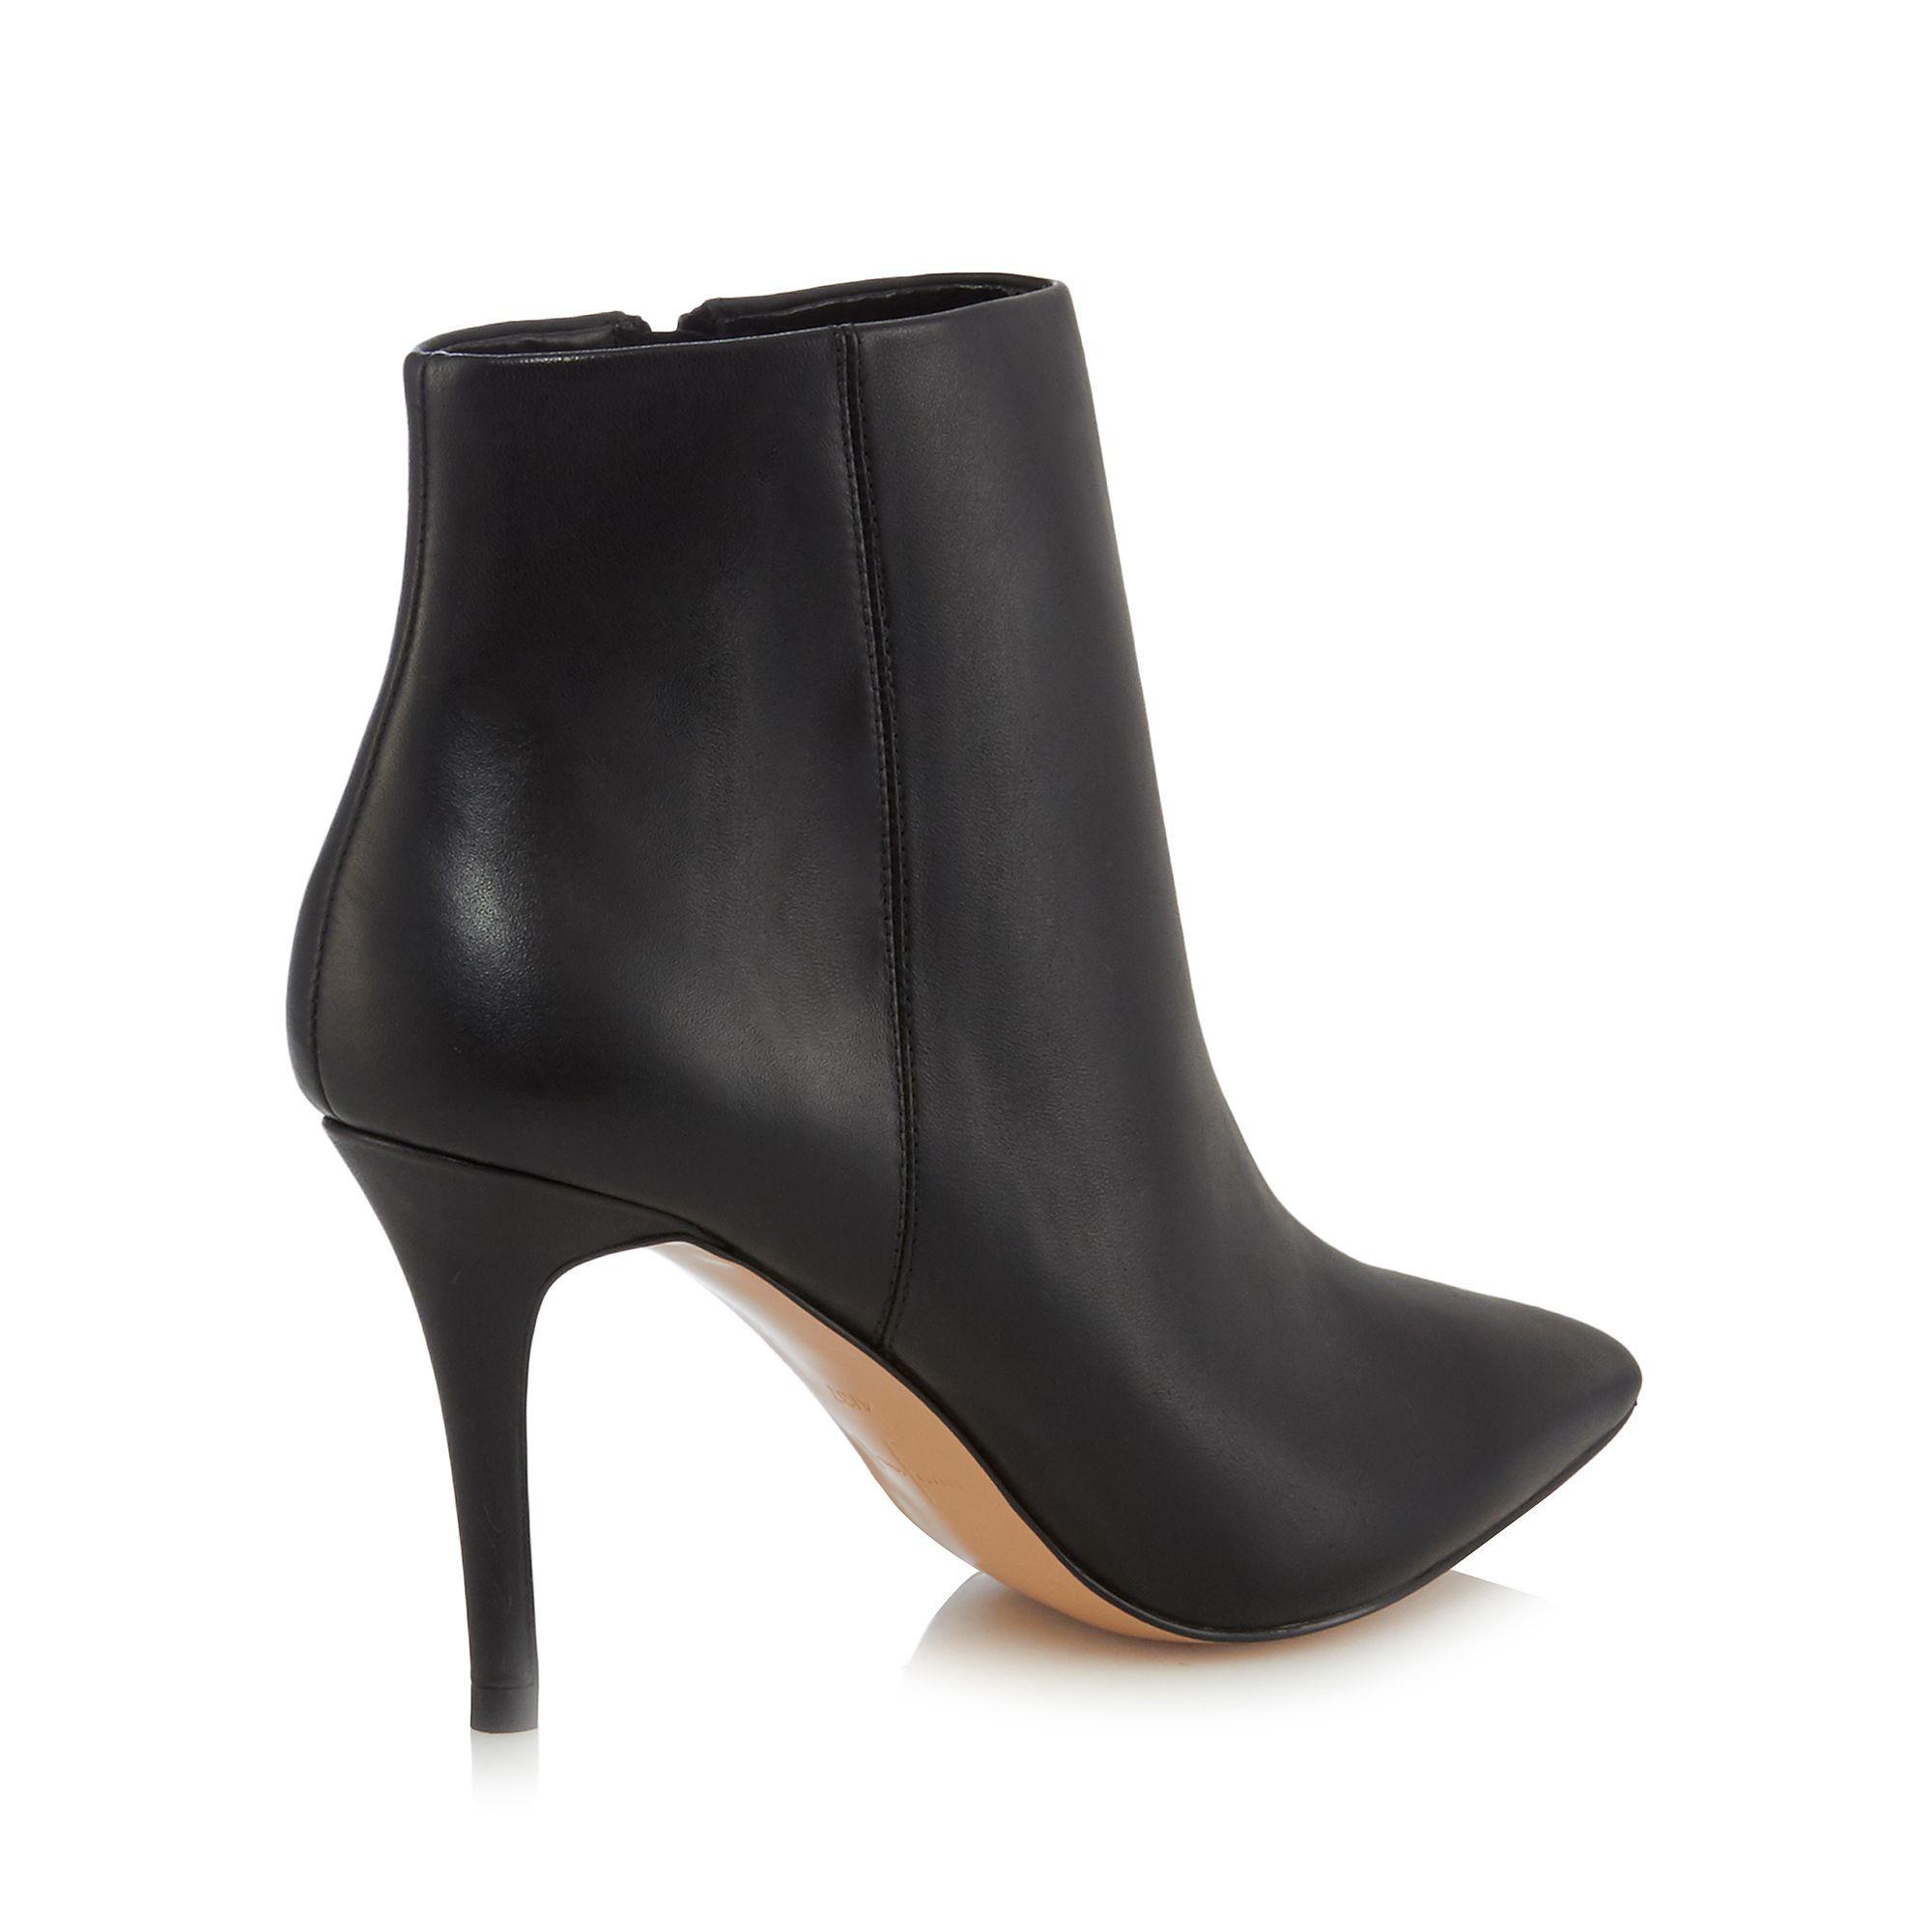 J By Jasper Conran Black Leather 'jordyn' High Stiletto Heel Ankle Boots